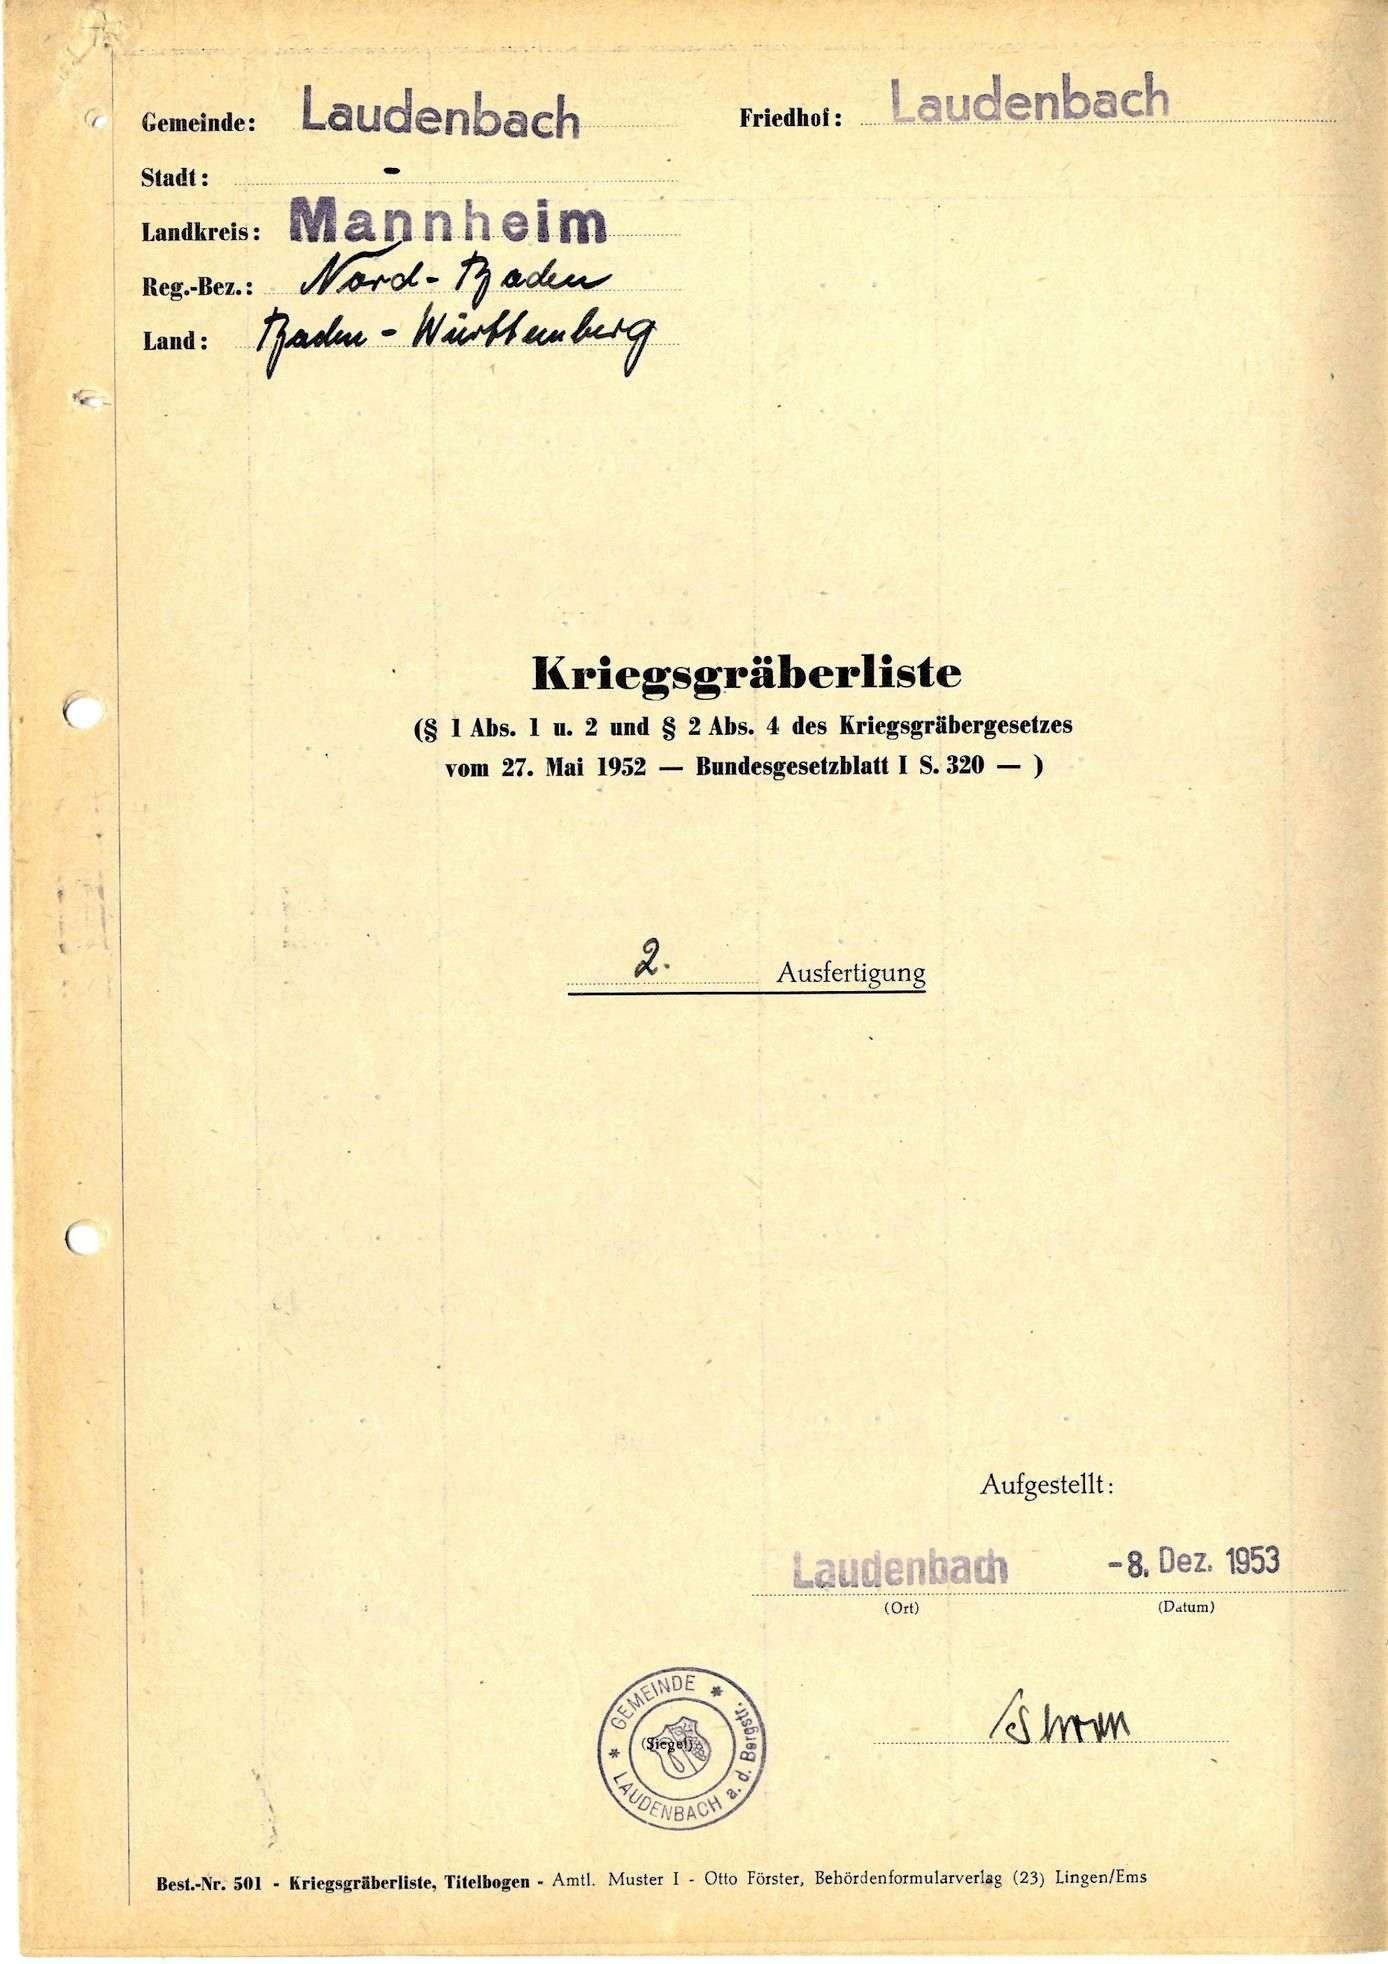 Laudenbach, Bild 1